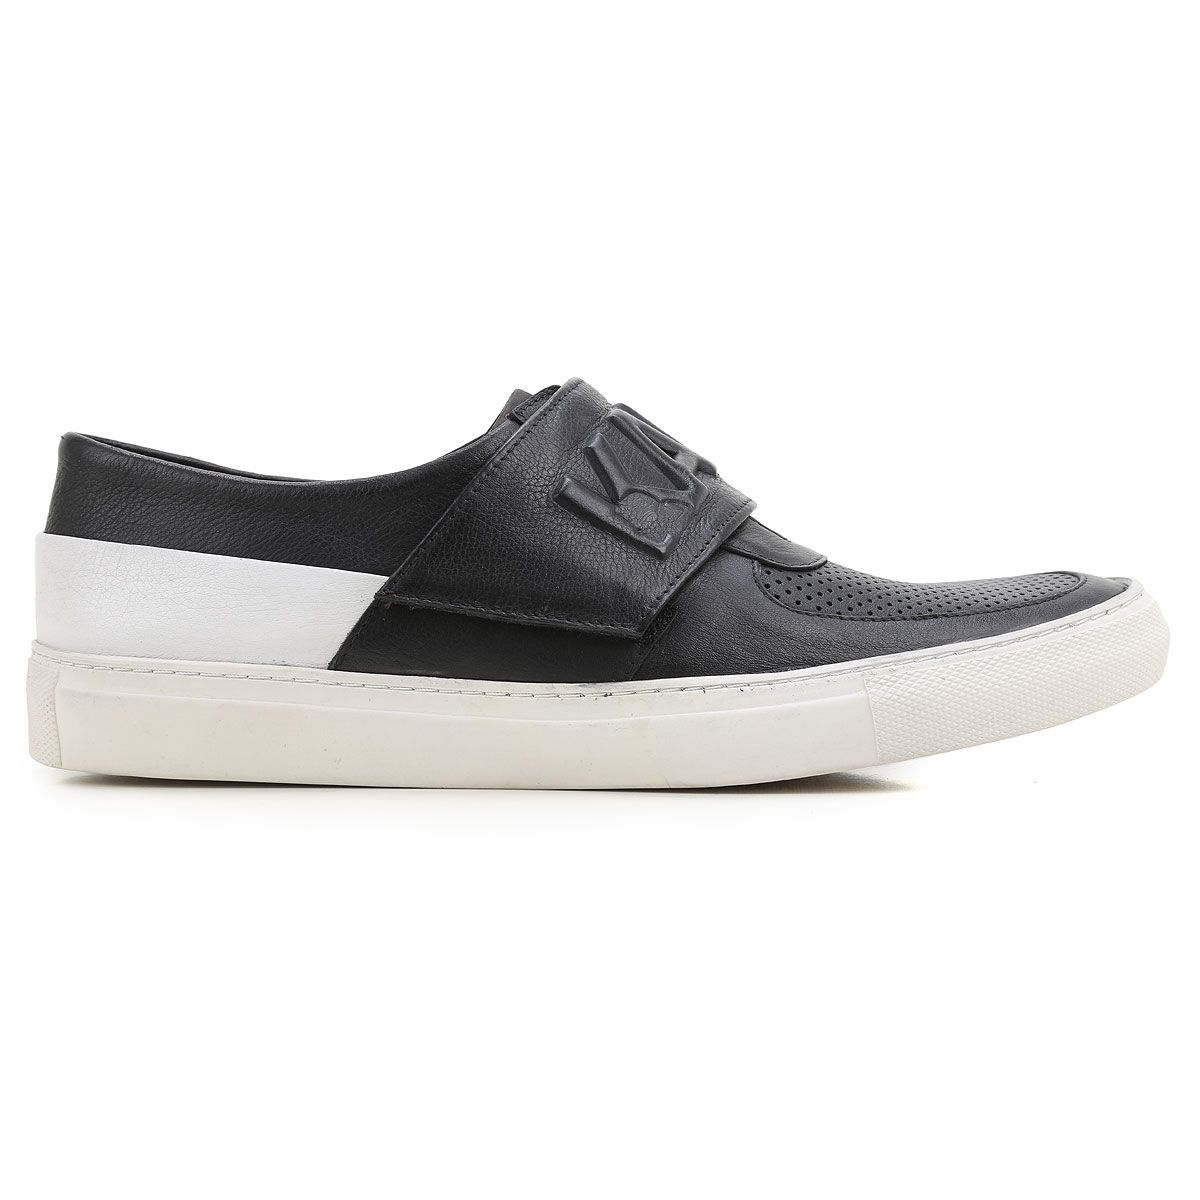 Karl Lagerfeld Men S Footwear Shoes Karl Lagerfeld